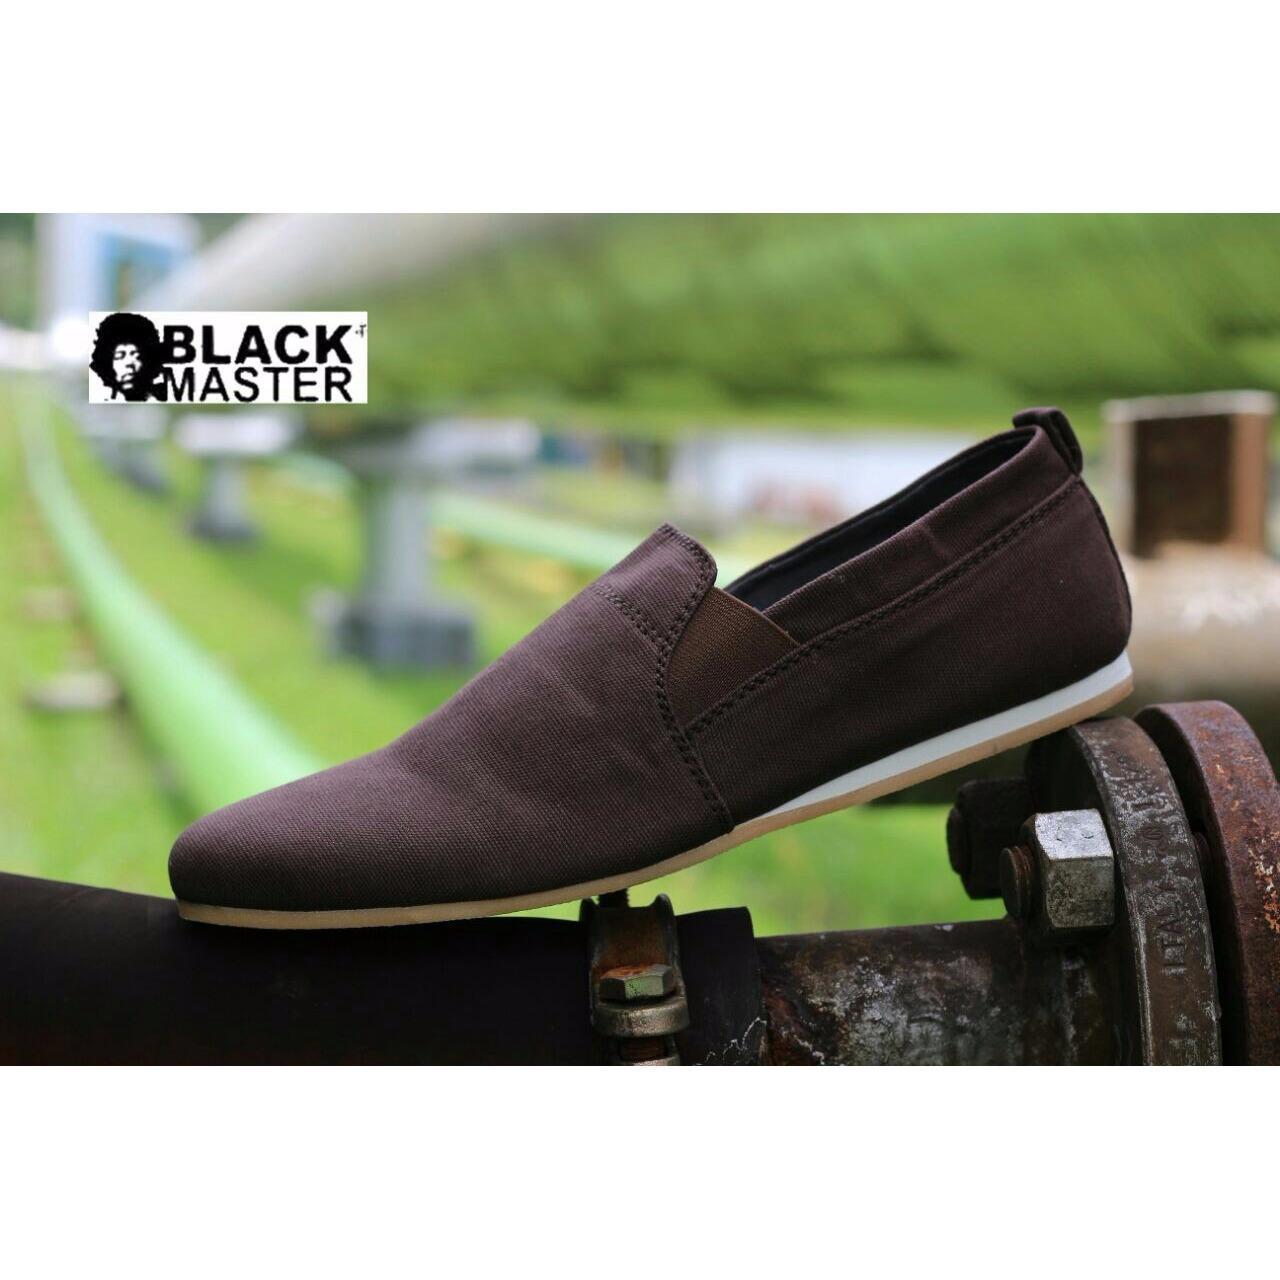 Jual Produk BLACKMASTER Online Terbaru di Lazada.co.id daf41d401e